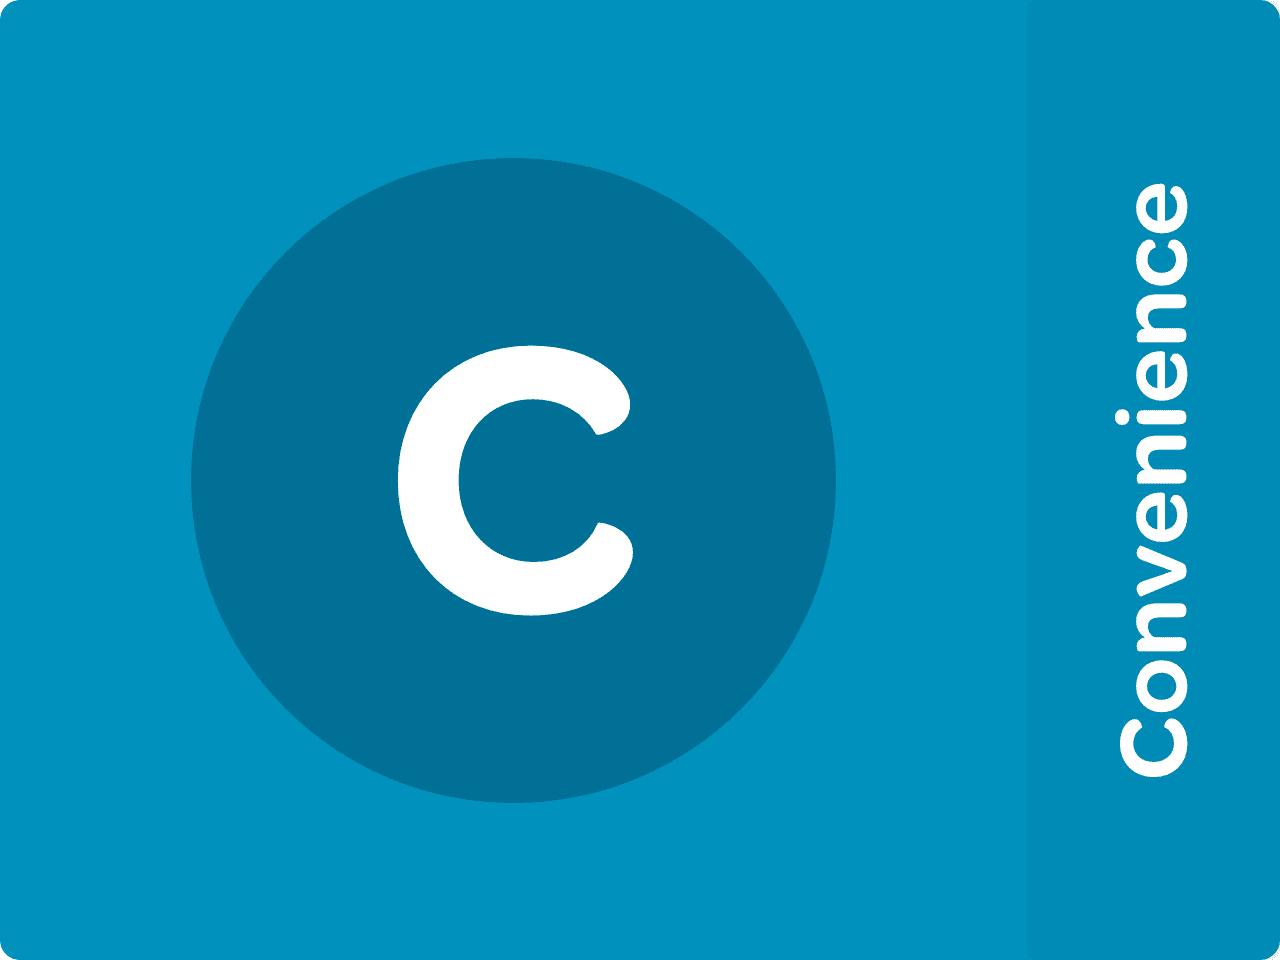 C - Convenience